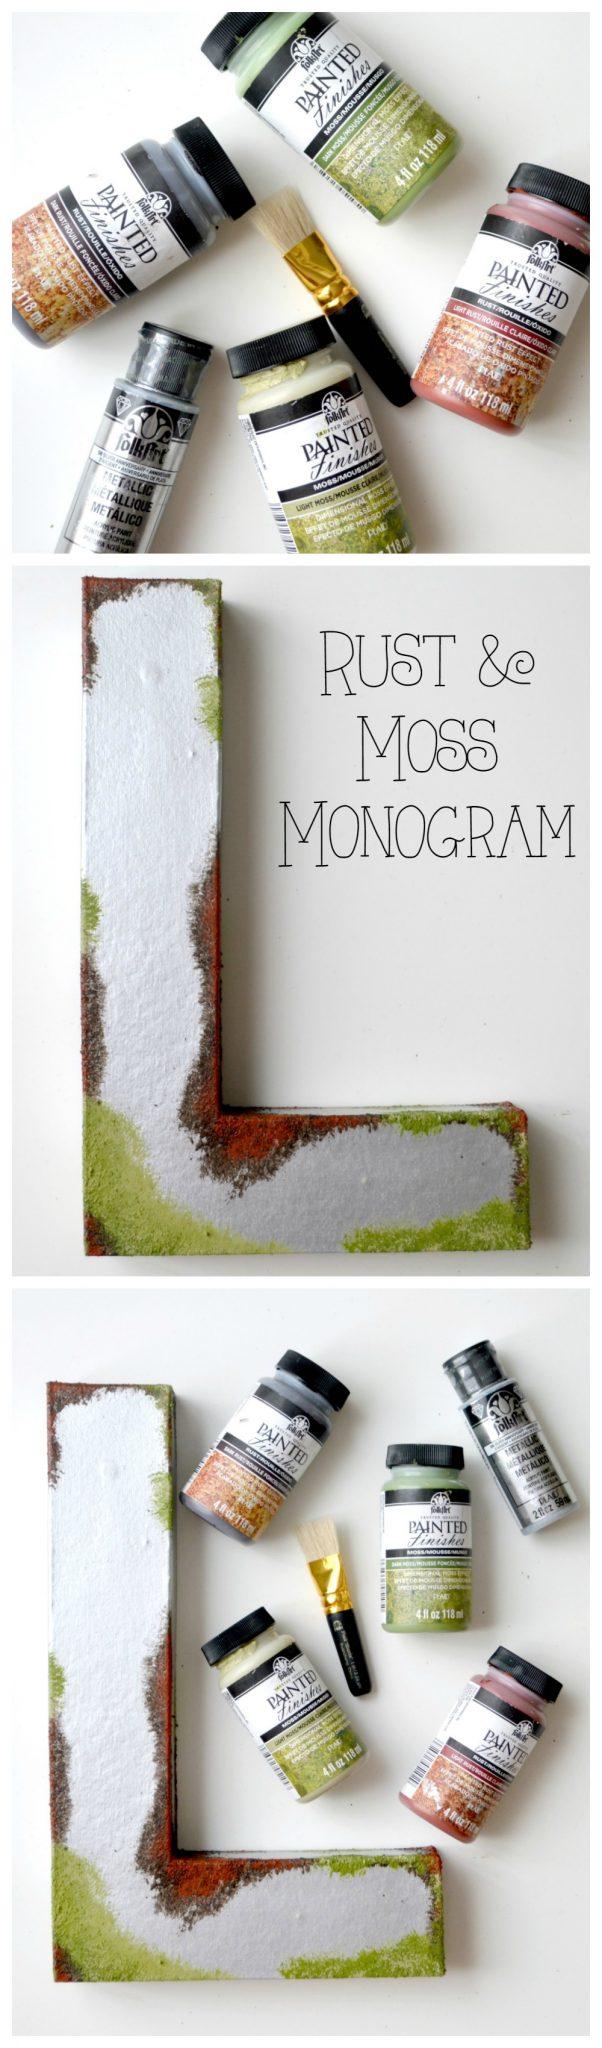 Rust & Moss Monogram